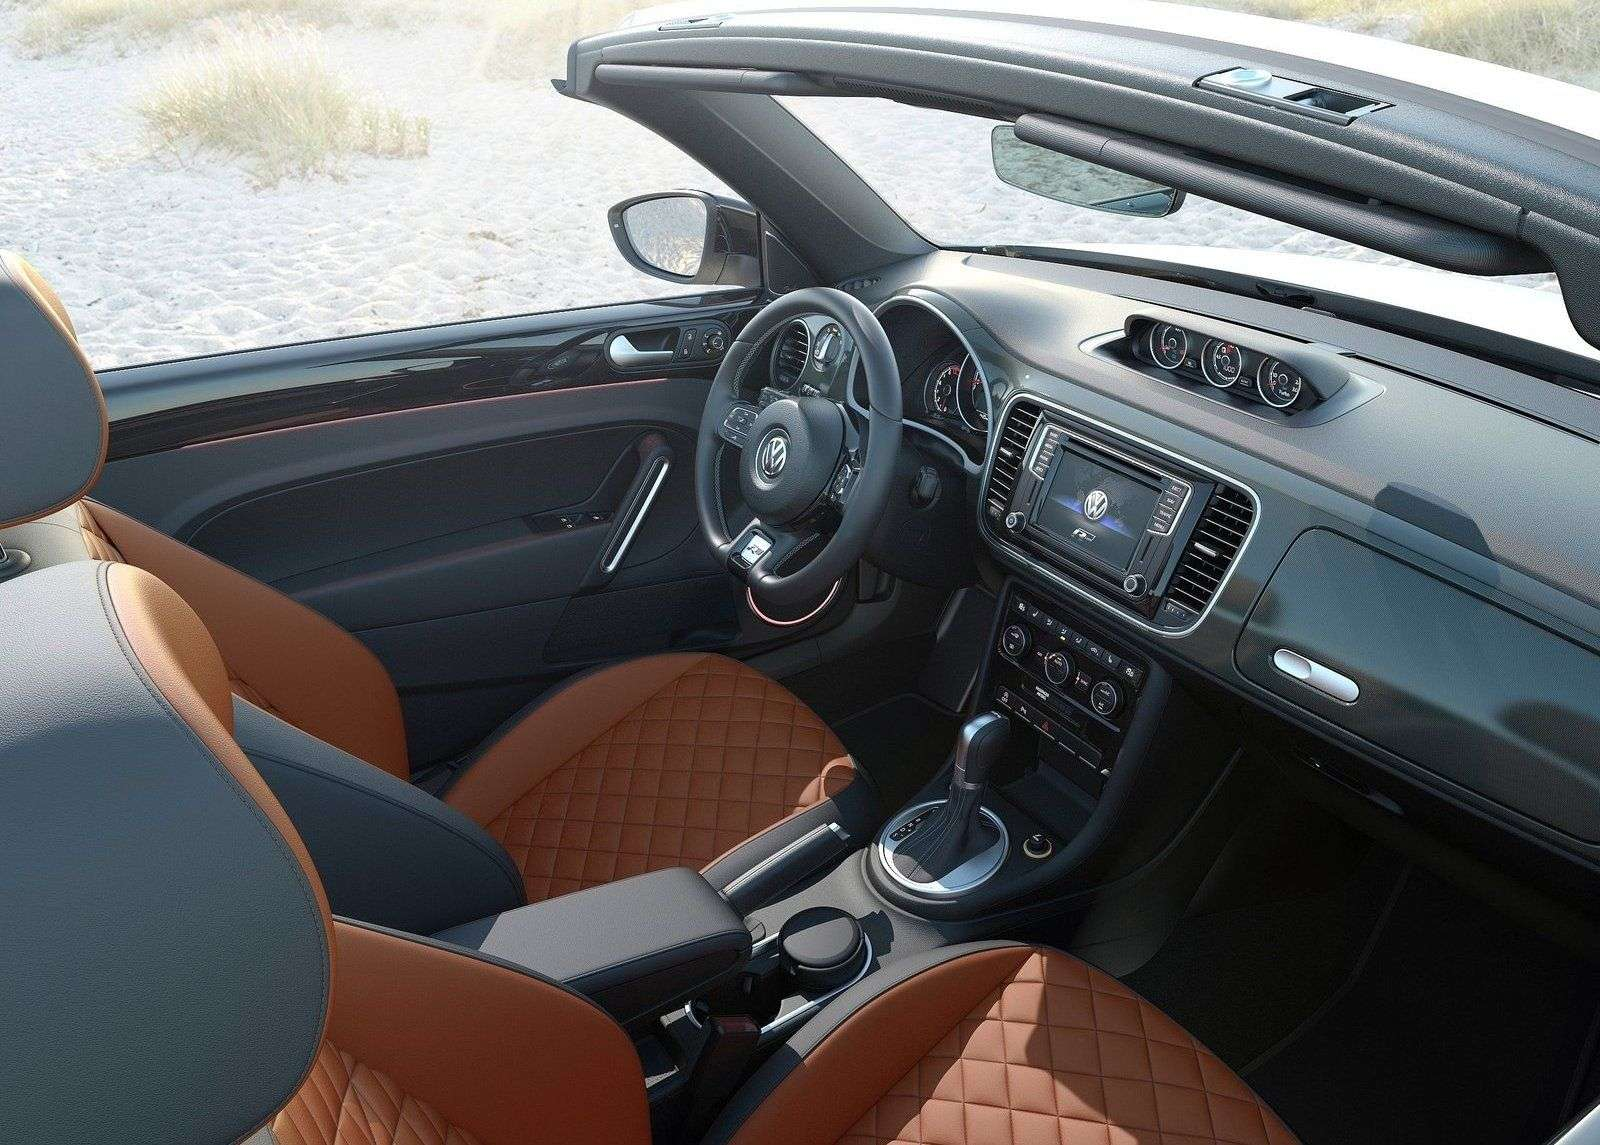 Обзор Volkswagen Beetle 2017: технические характеристики, цена